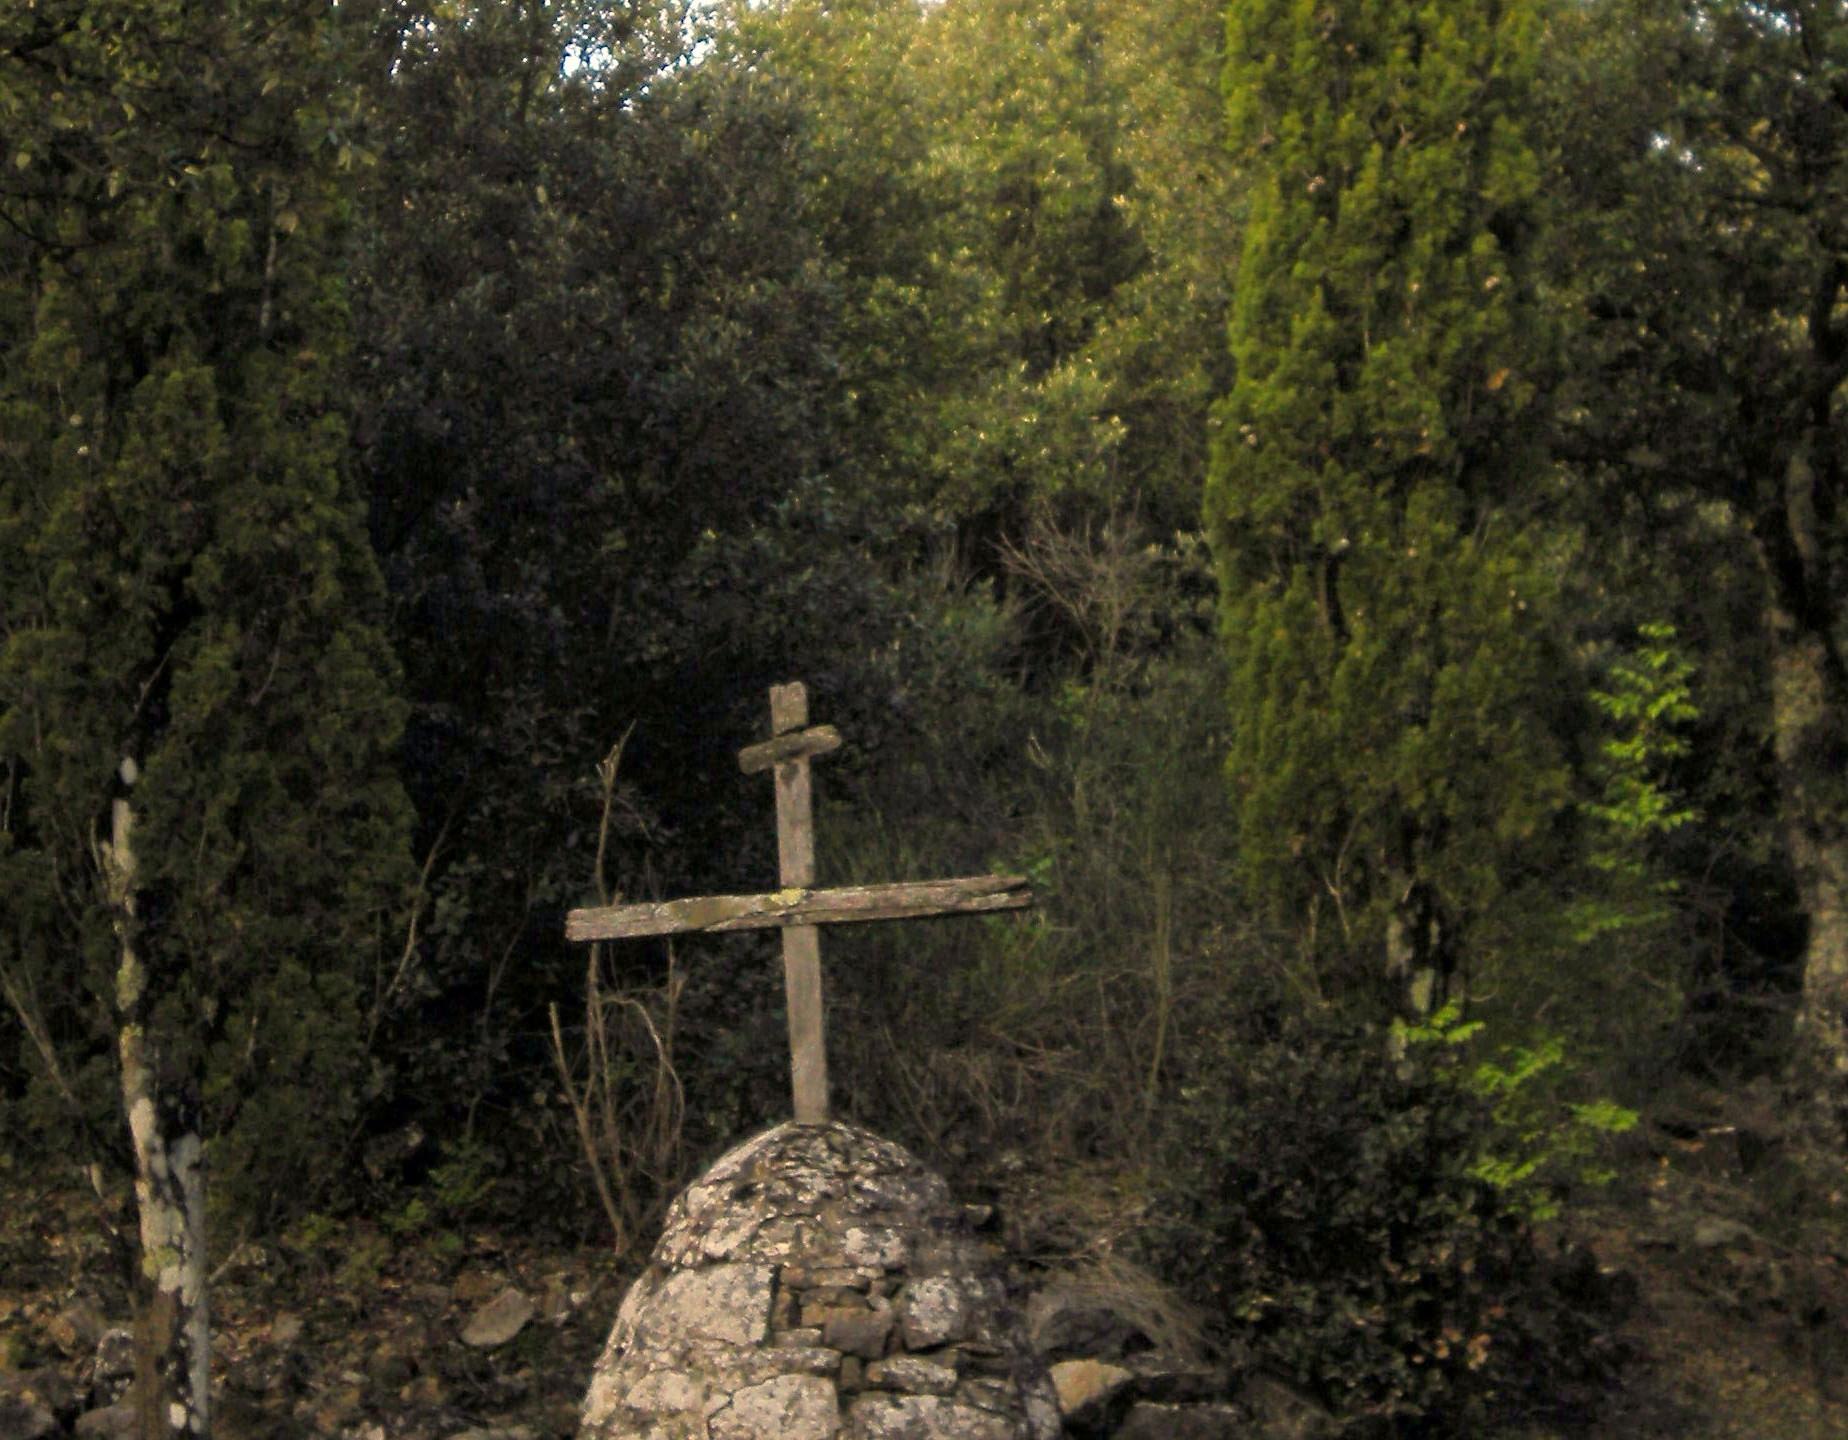 4_Ancient Cross